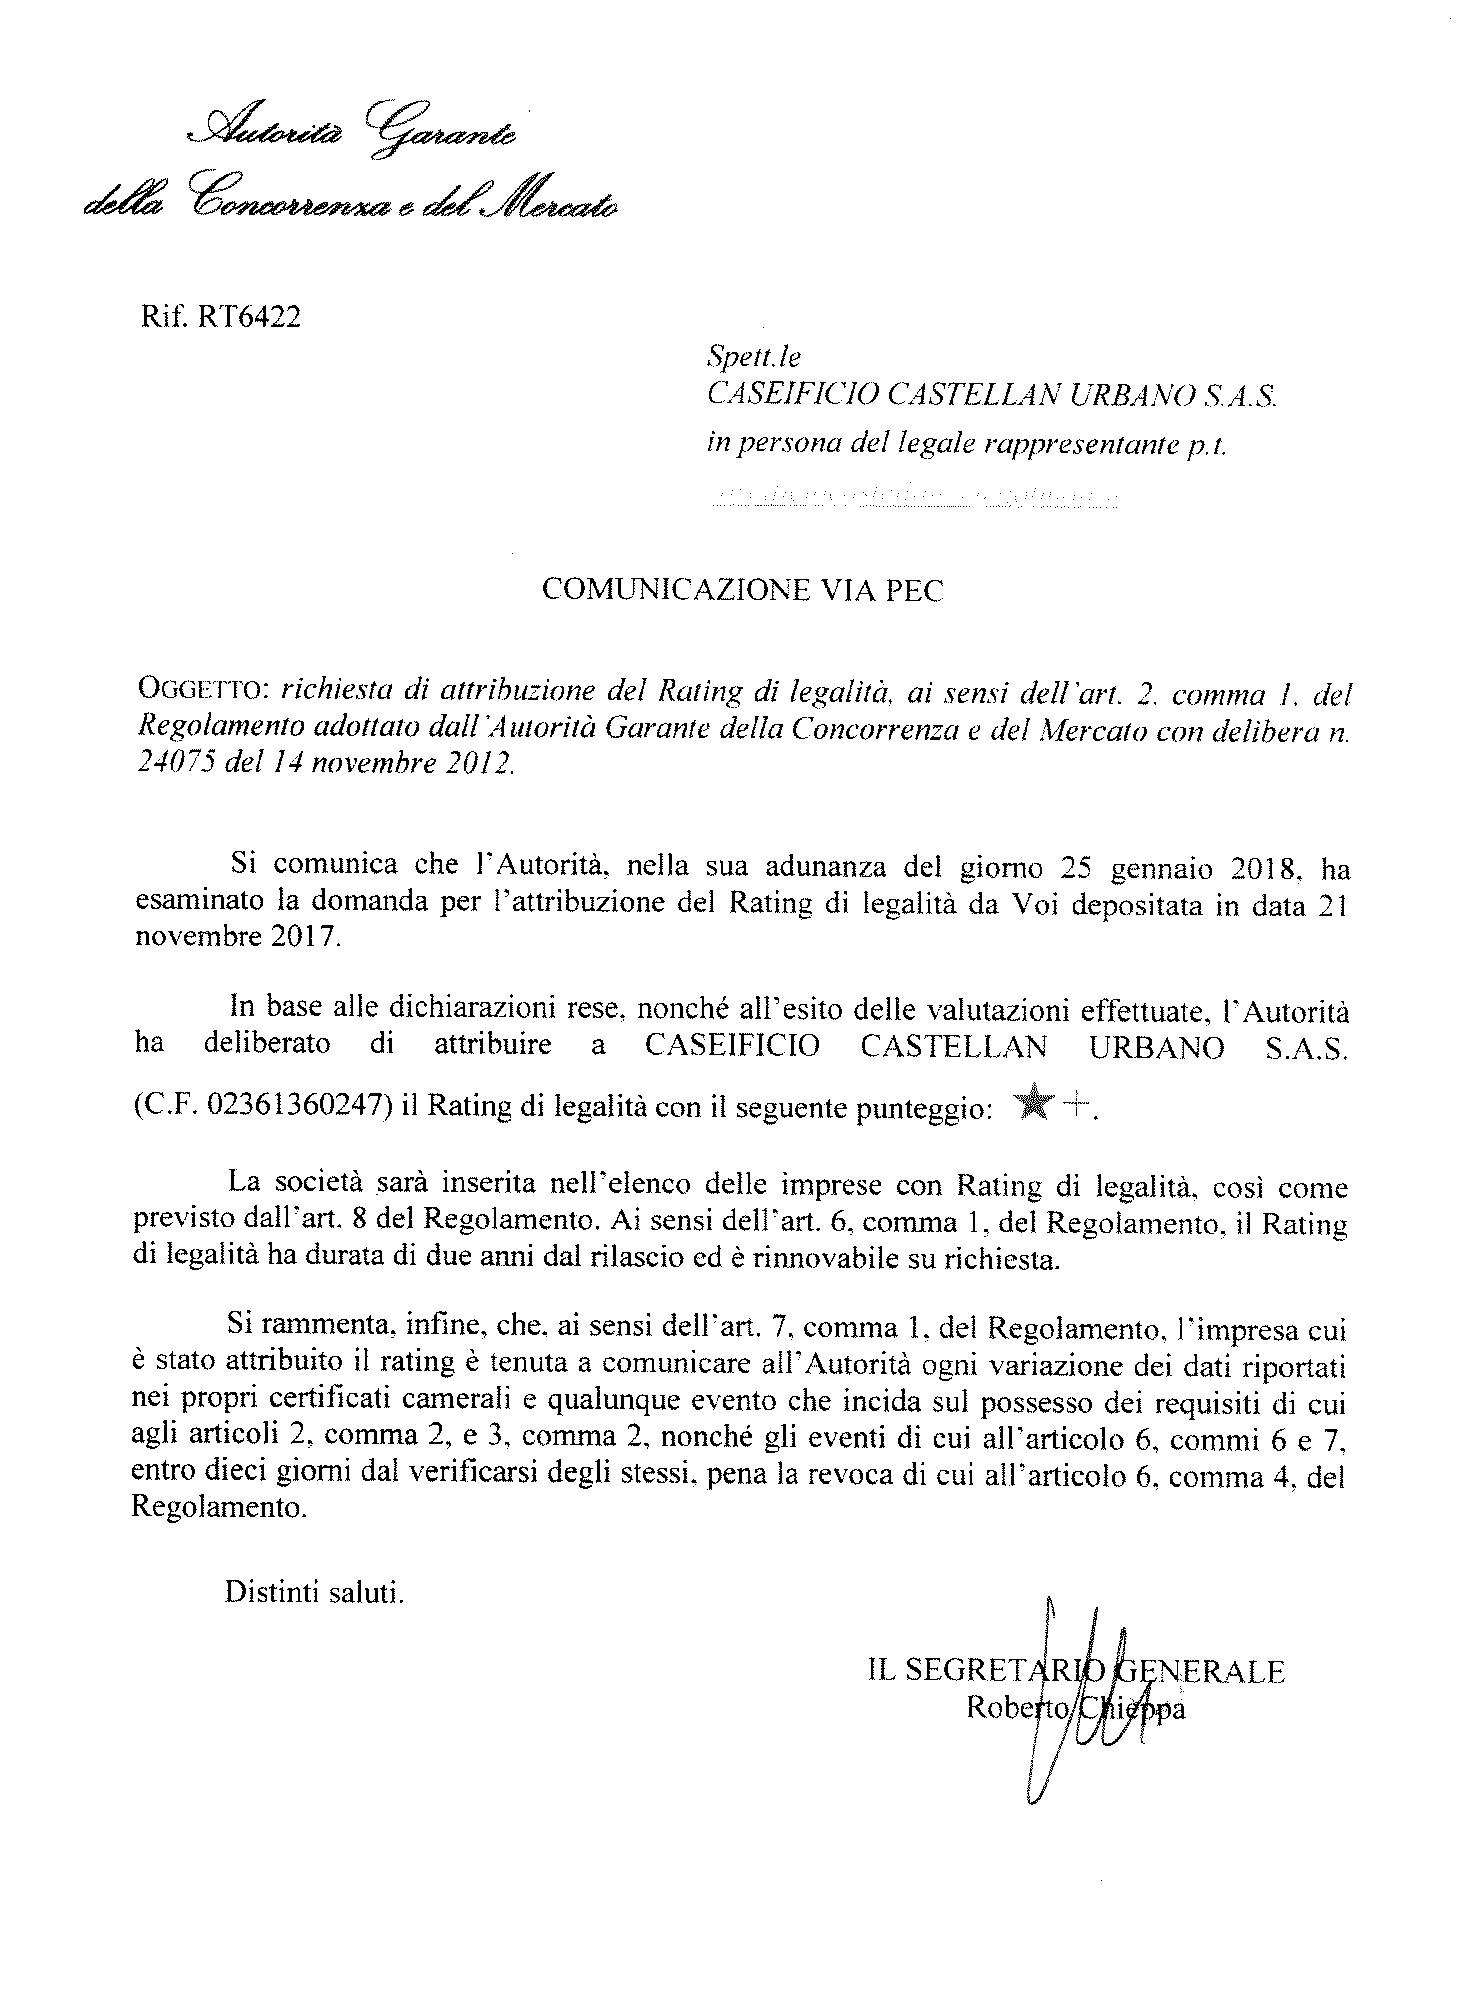 Rating legalità 2018 Caseificio Castellan Urbano